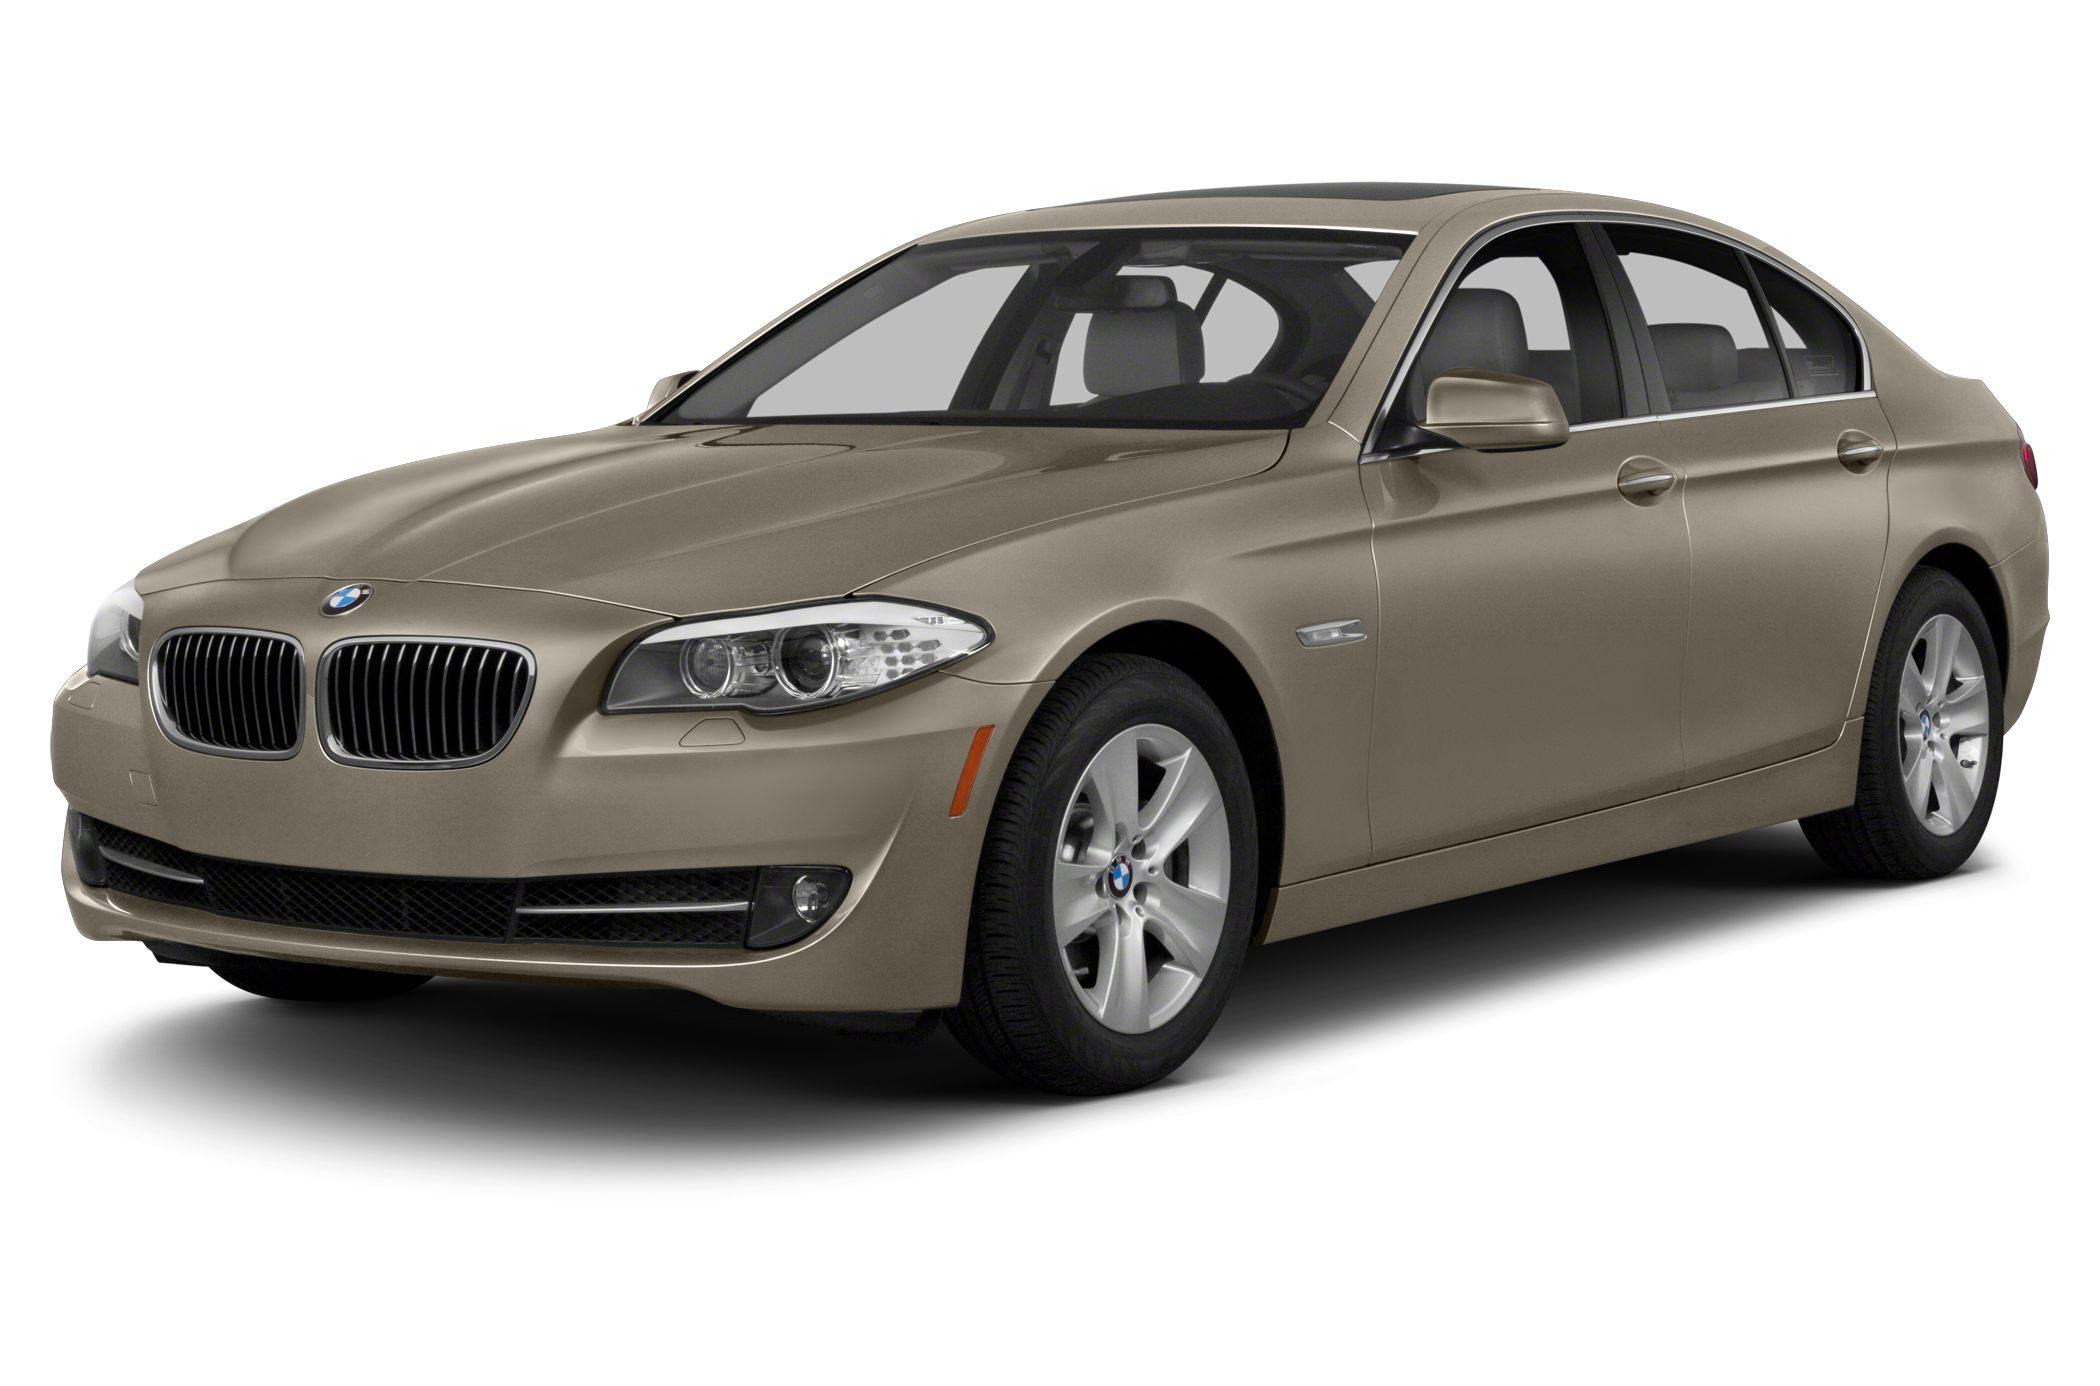 2013 BMW 550 I XDrive Sedan for sale in Bala Cynwyd for $53,992 with 24,586 miles